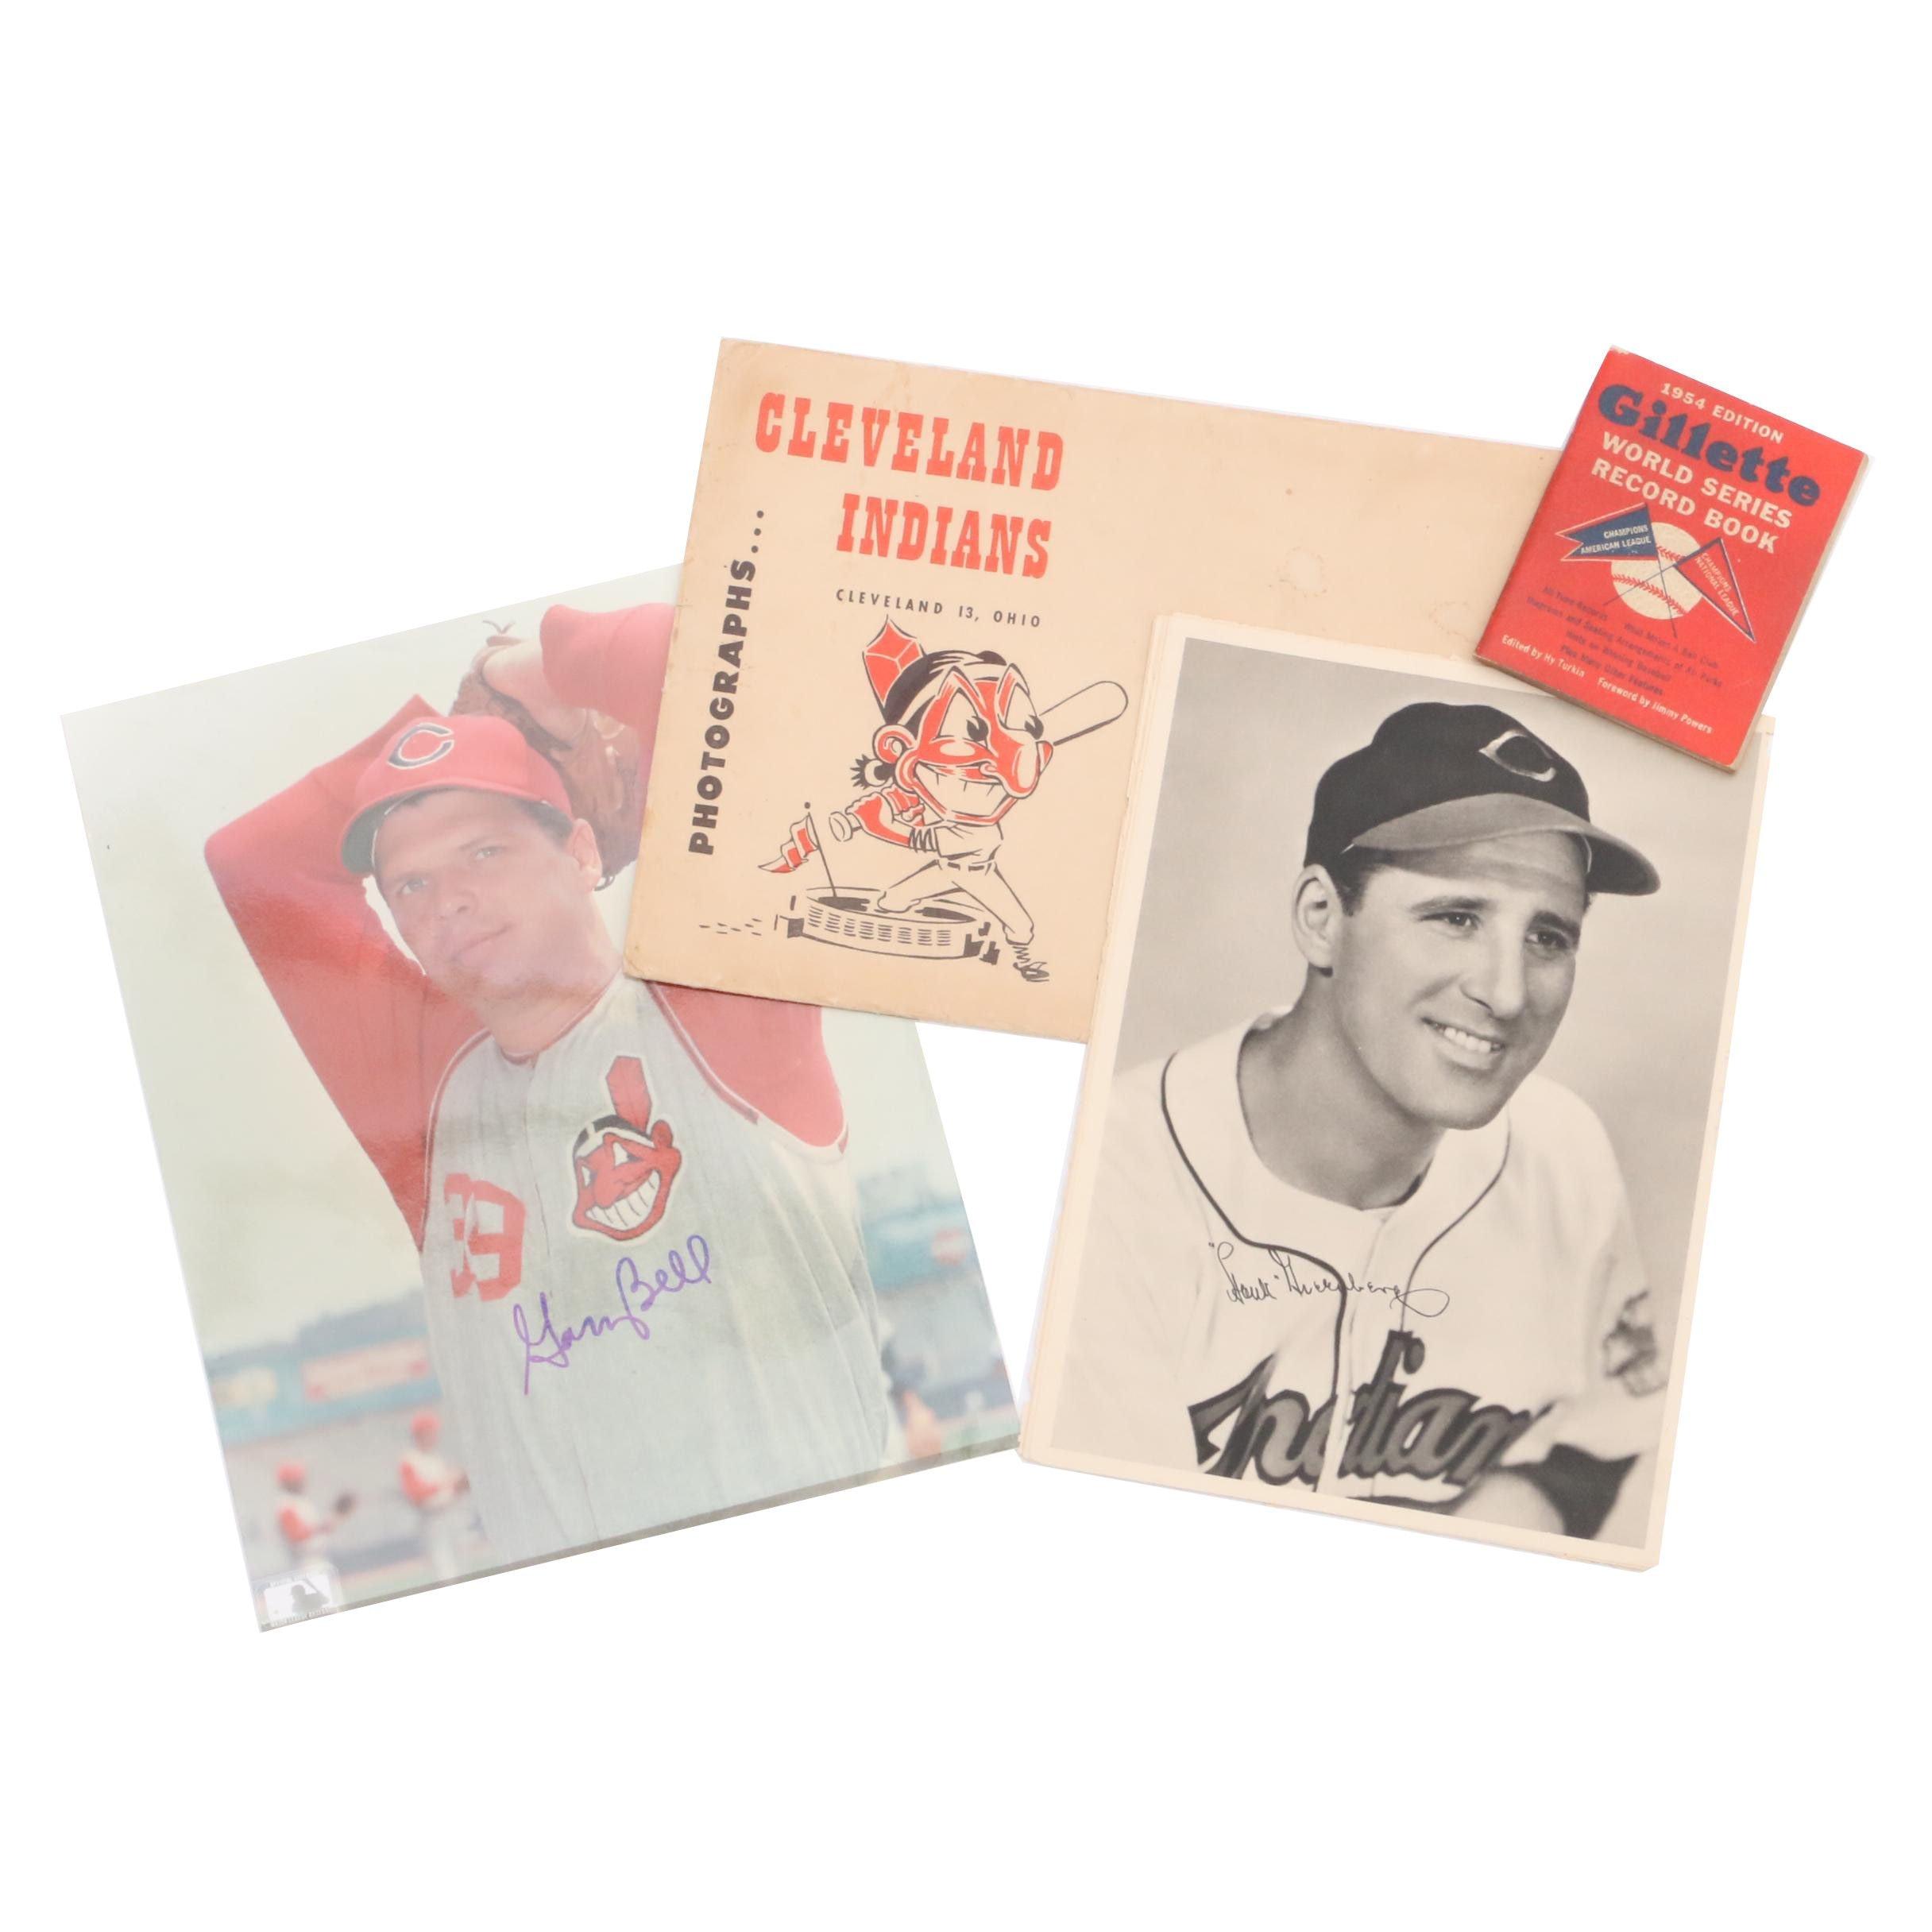 Cleveland Indians Vintage Items